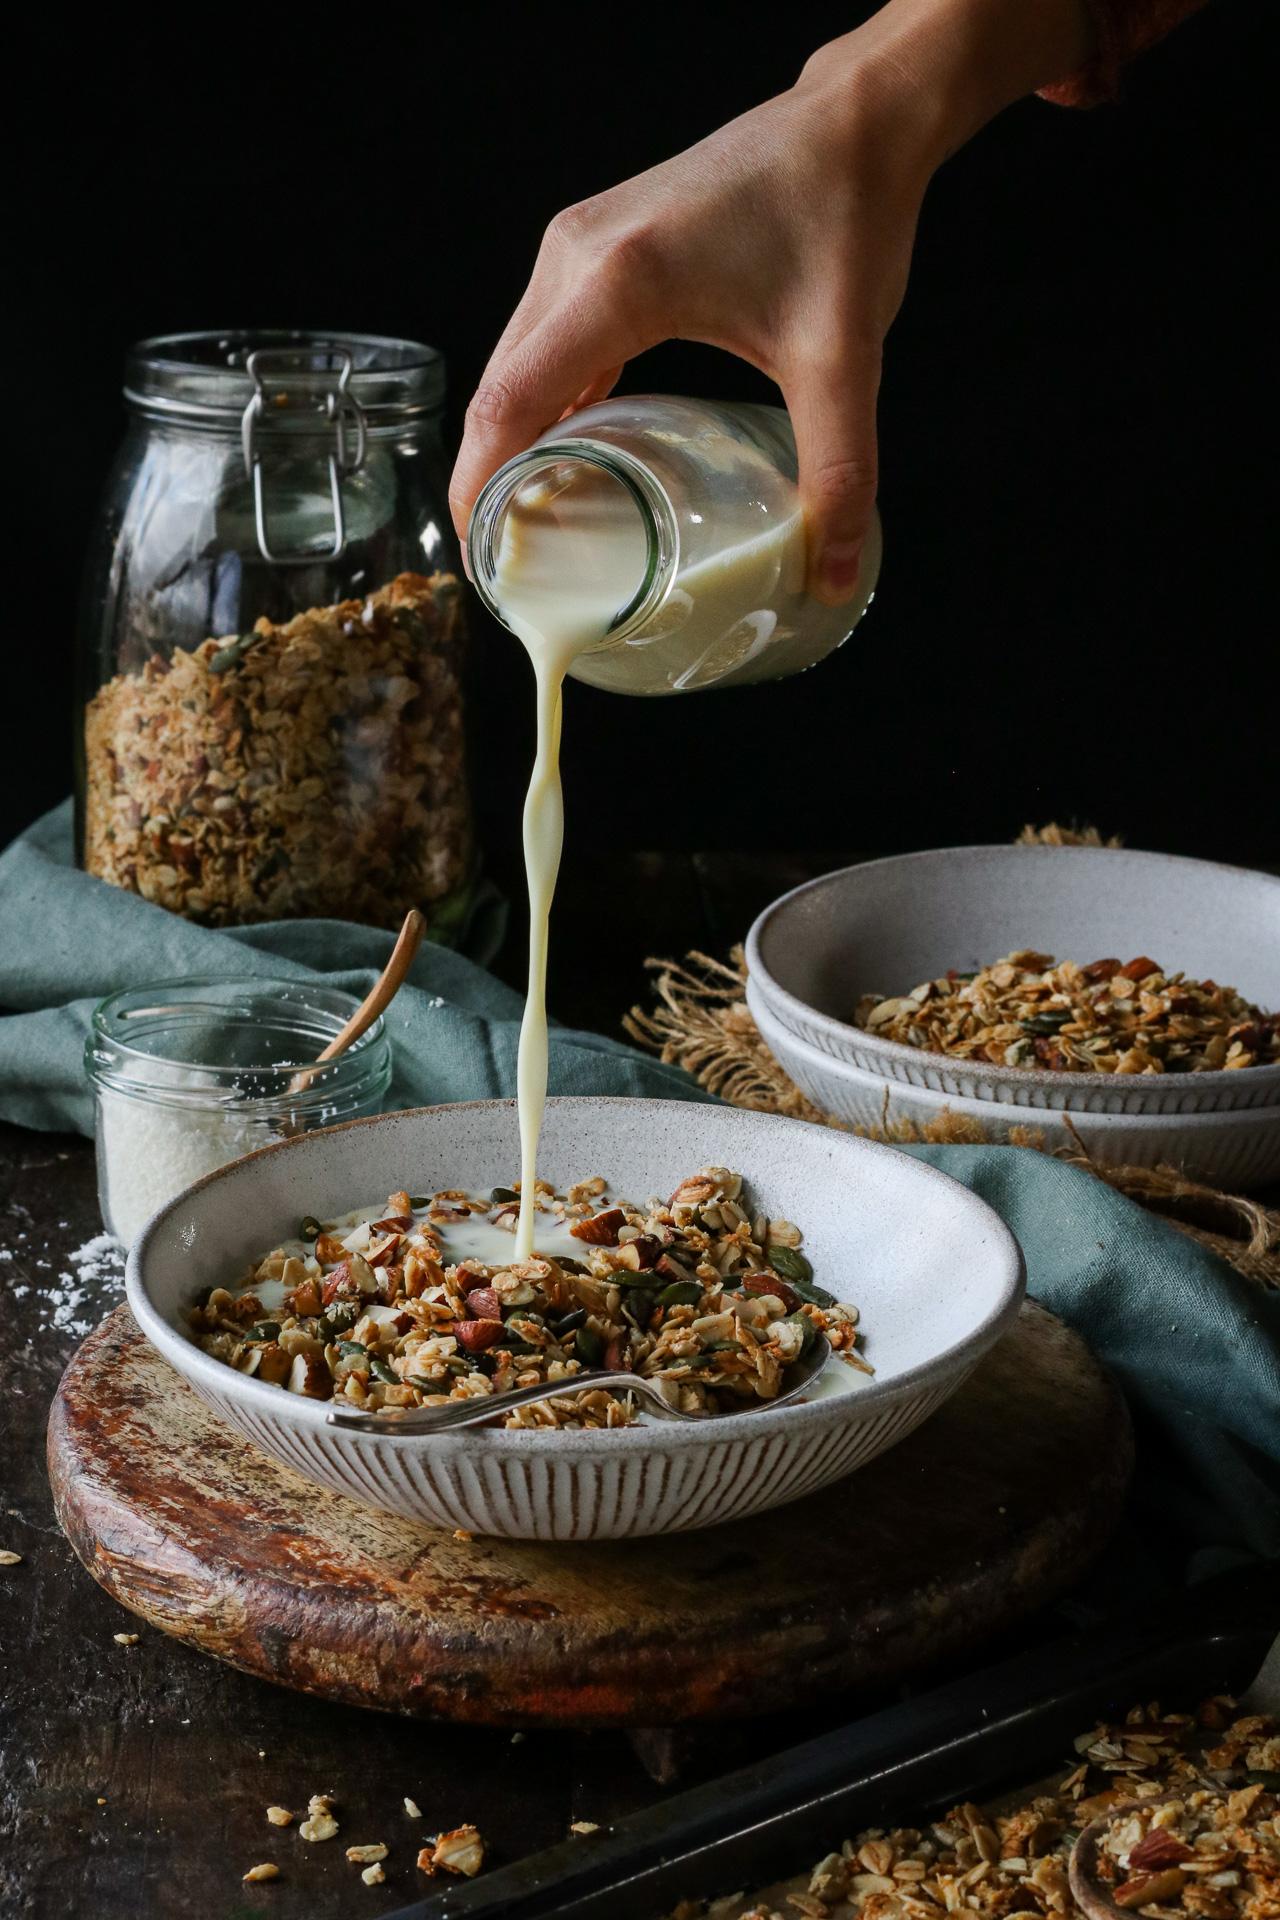 pouring plant-based milk onto granola